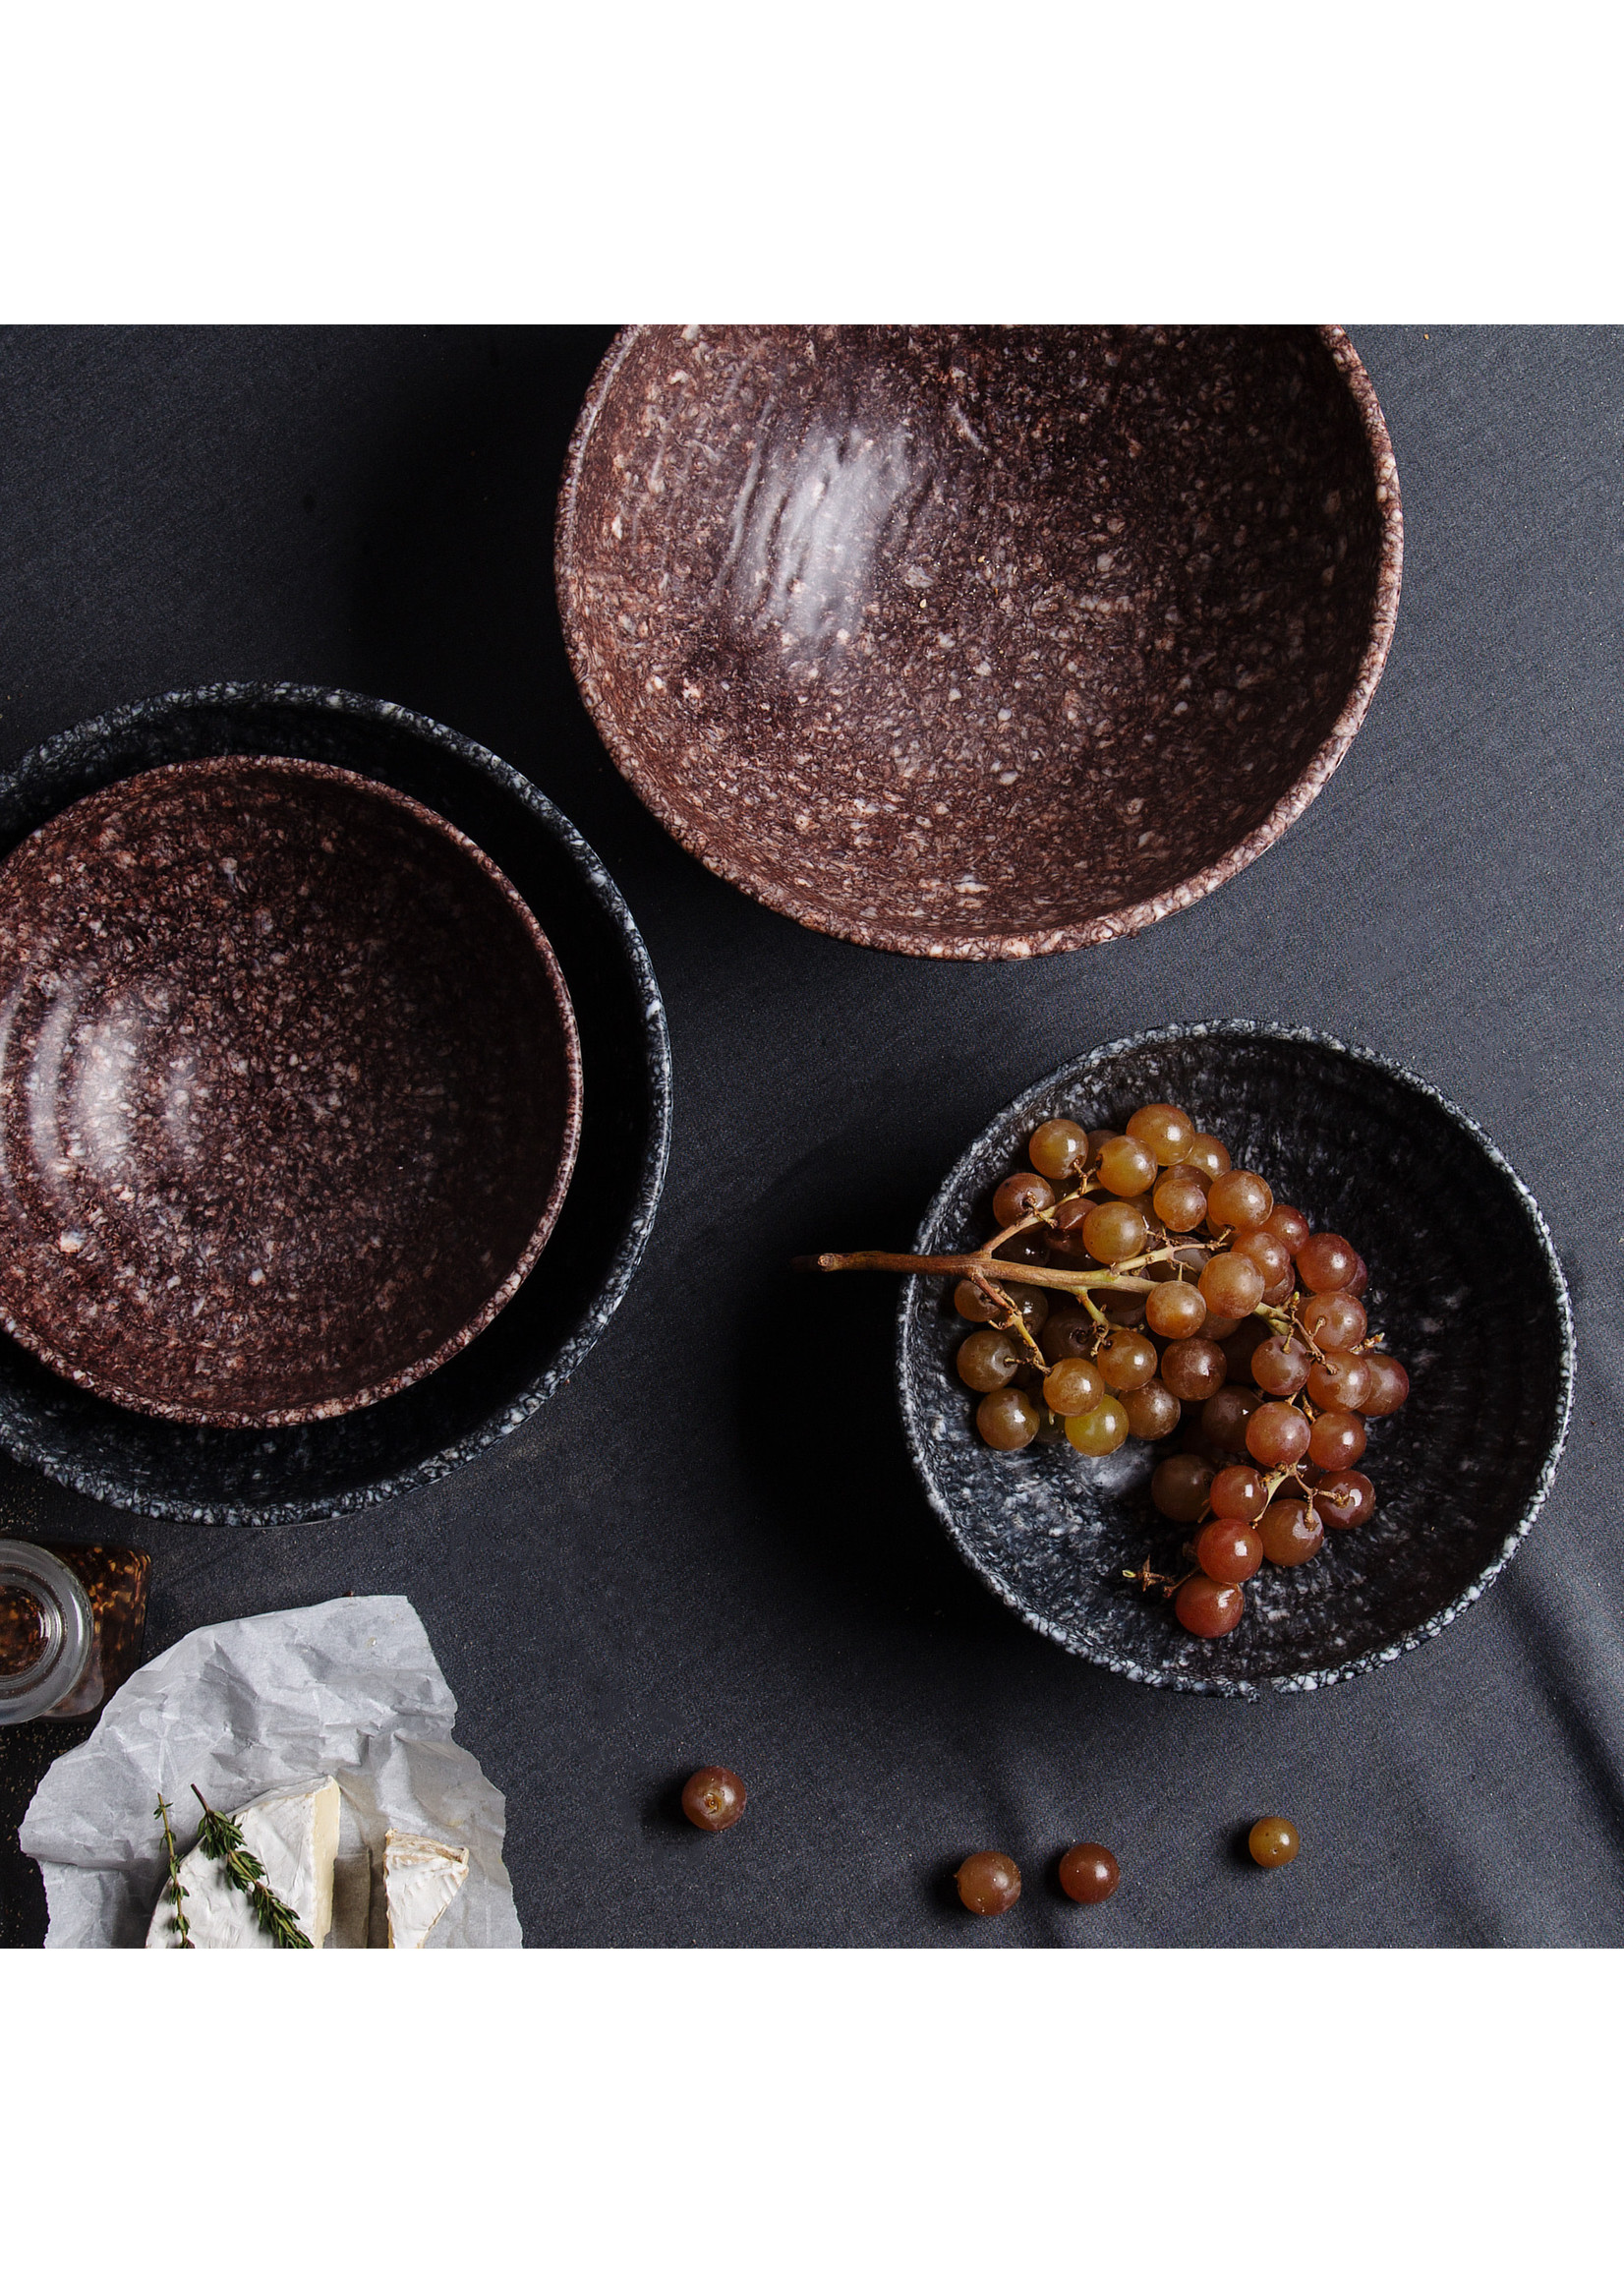 Home Essentials 68 oz  Black Marble Finish Melamine Bowl